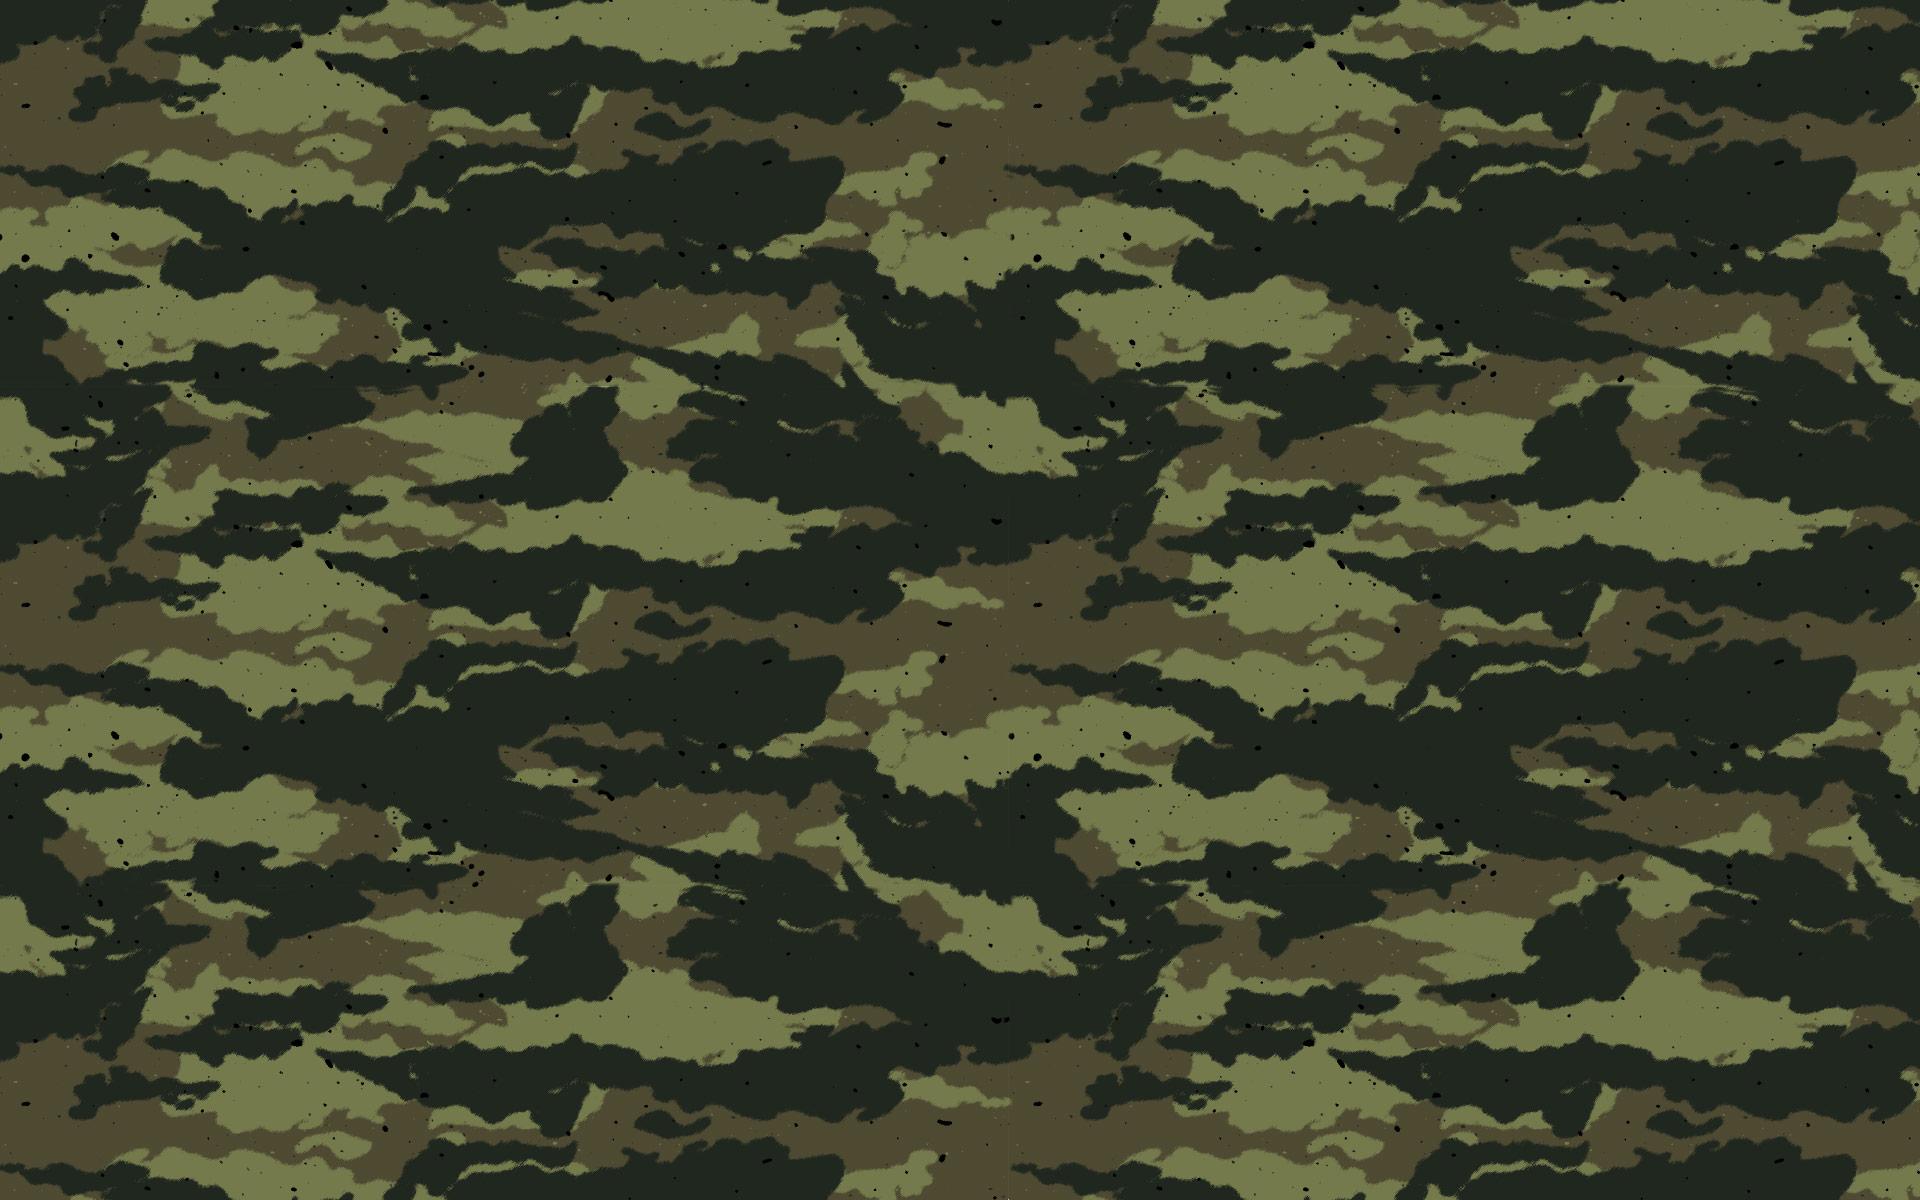 Black Desert Hd Wallpaper Camo Hd Wallpapers Pixelstalk Net